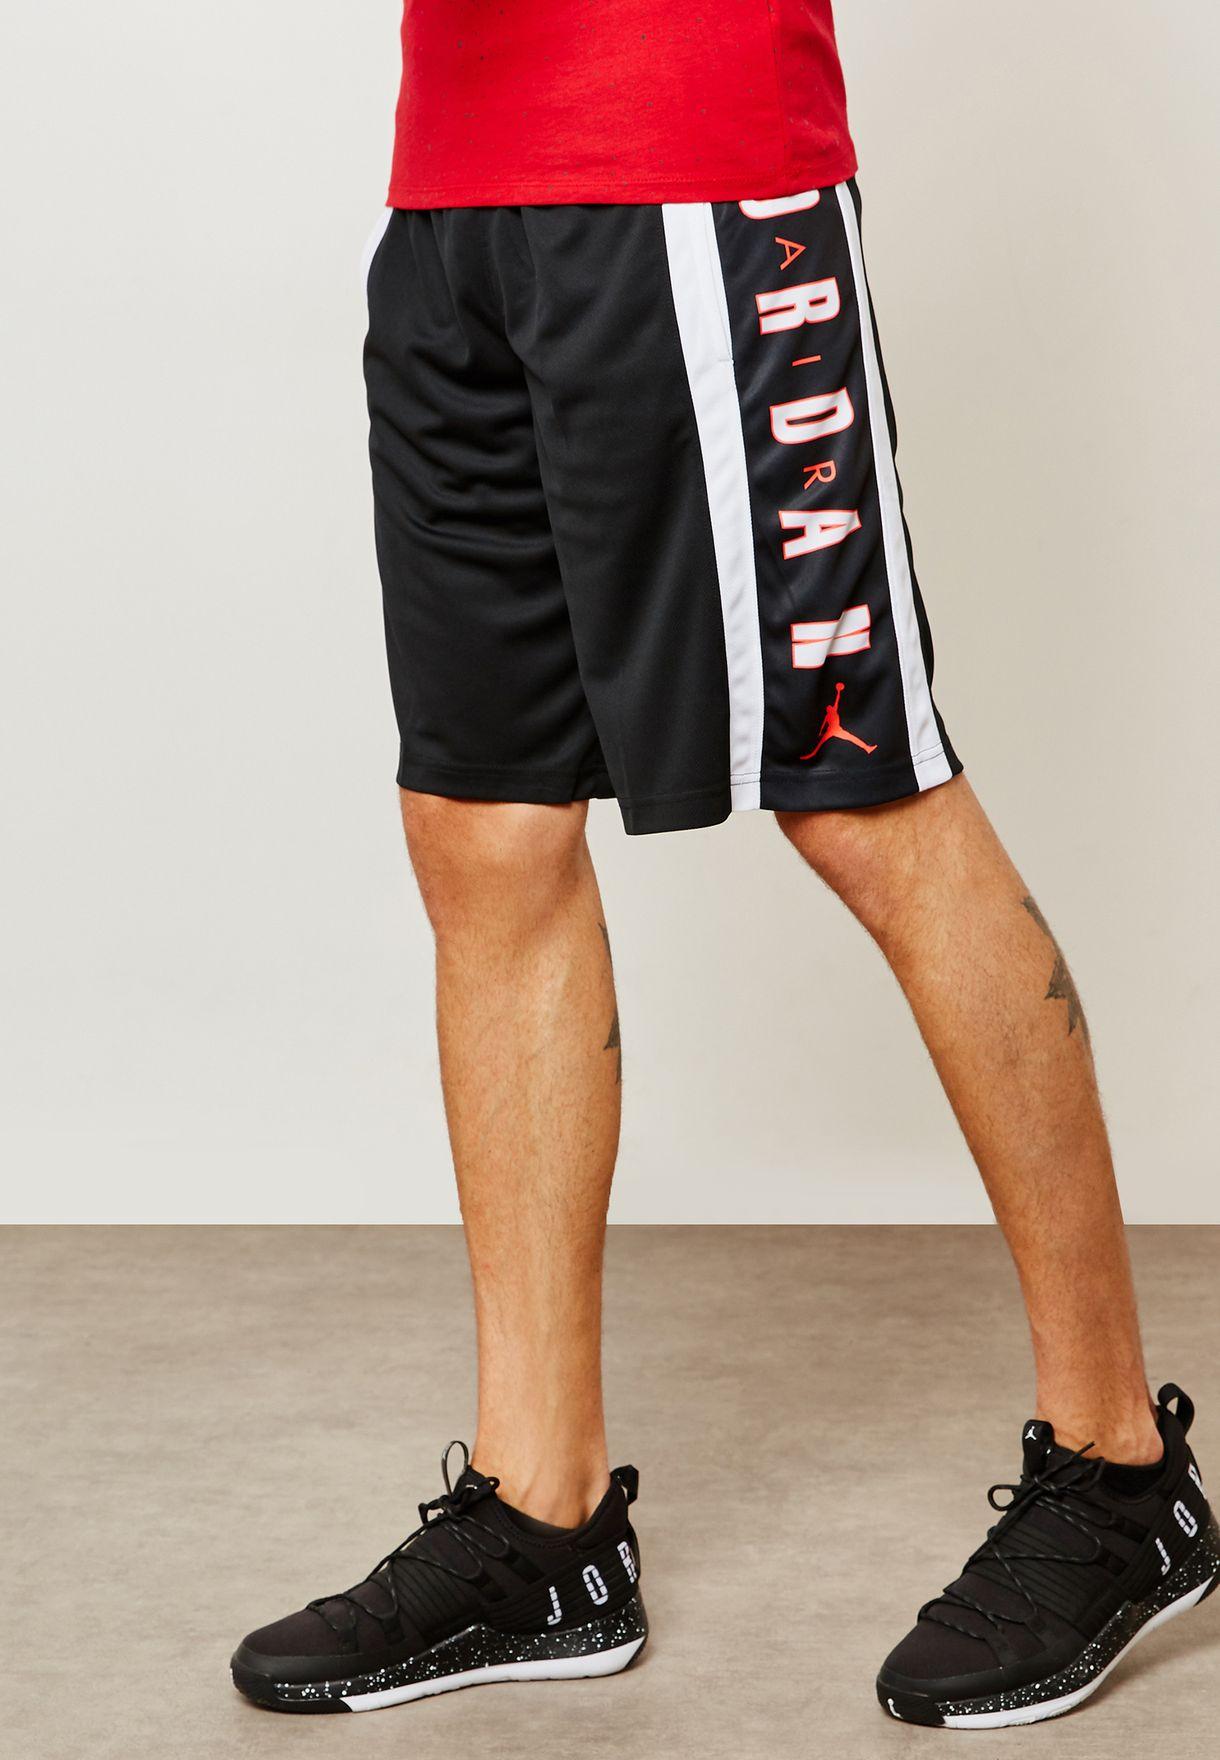 hot sale online fb649 3bdb7 Jordan Rise 3 Shorts